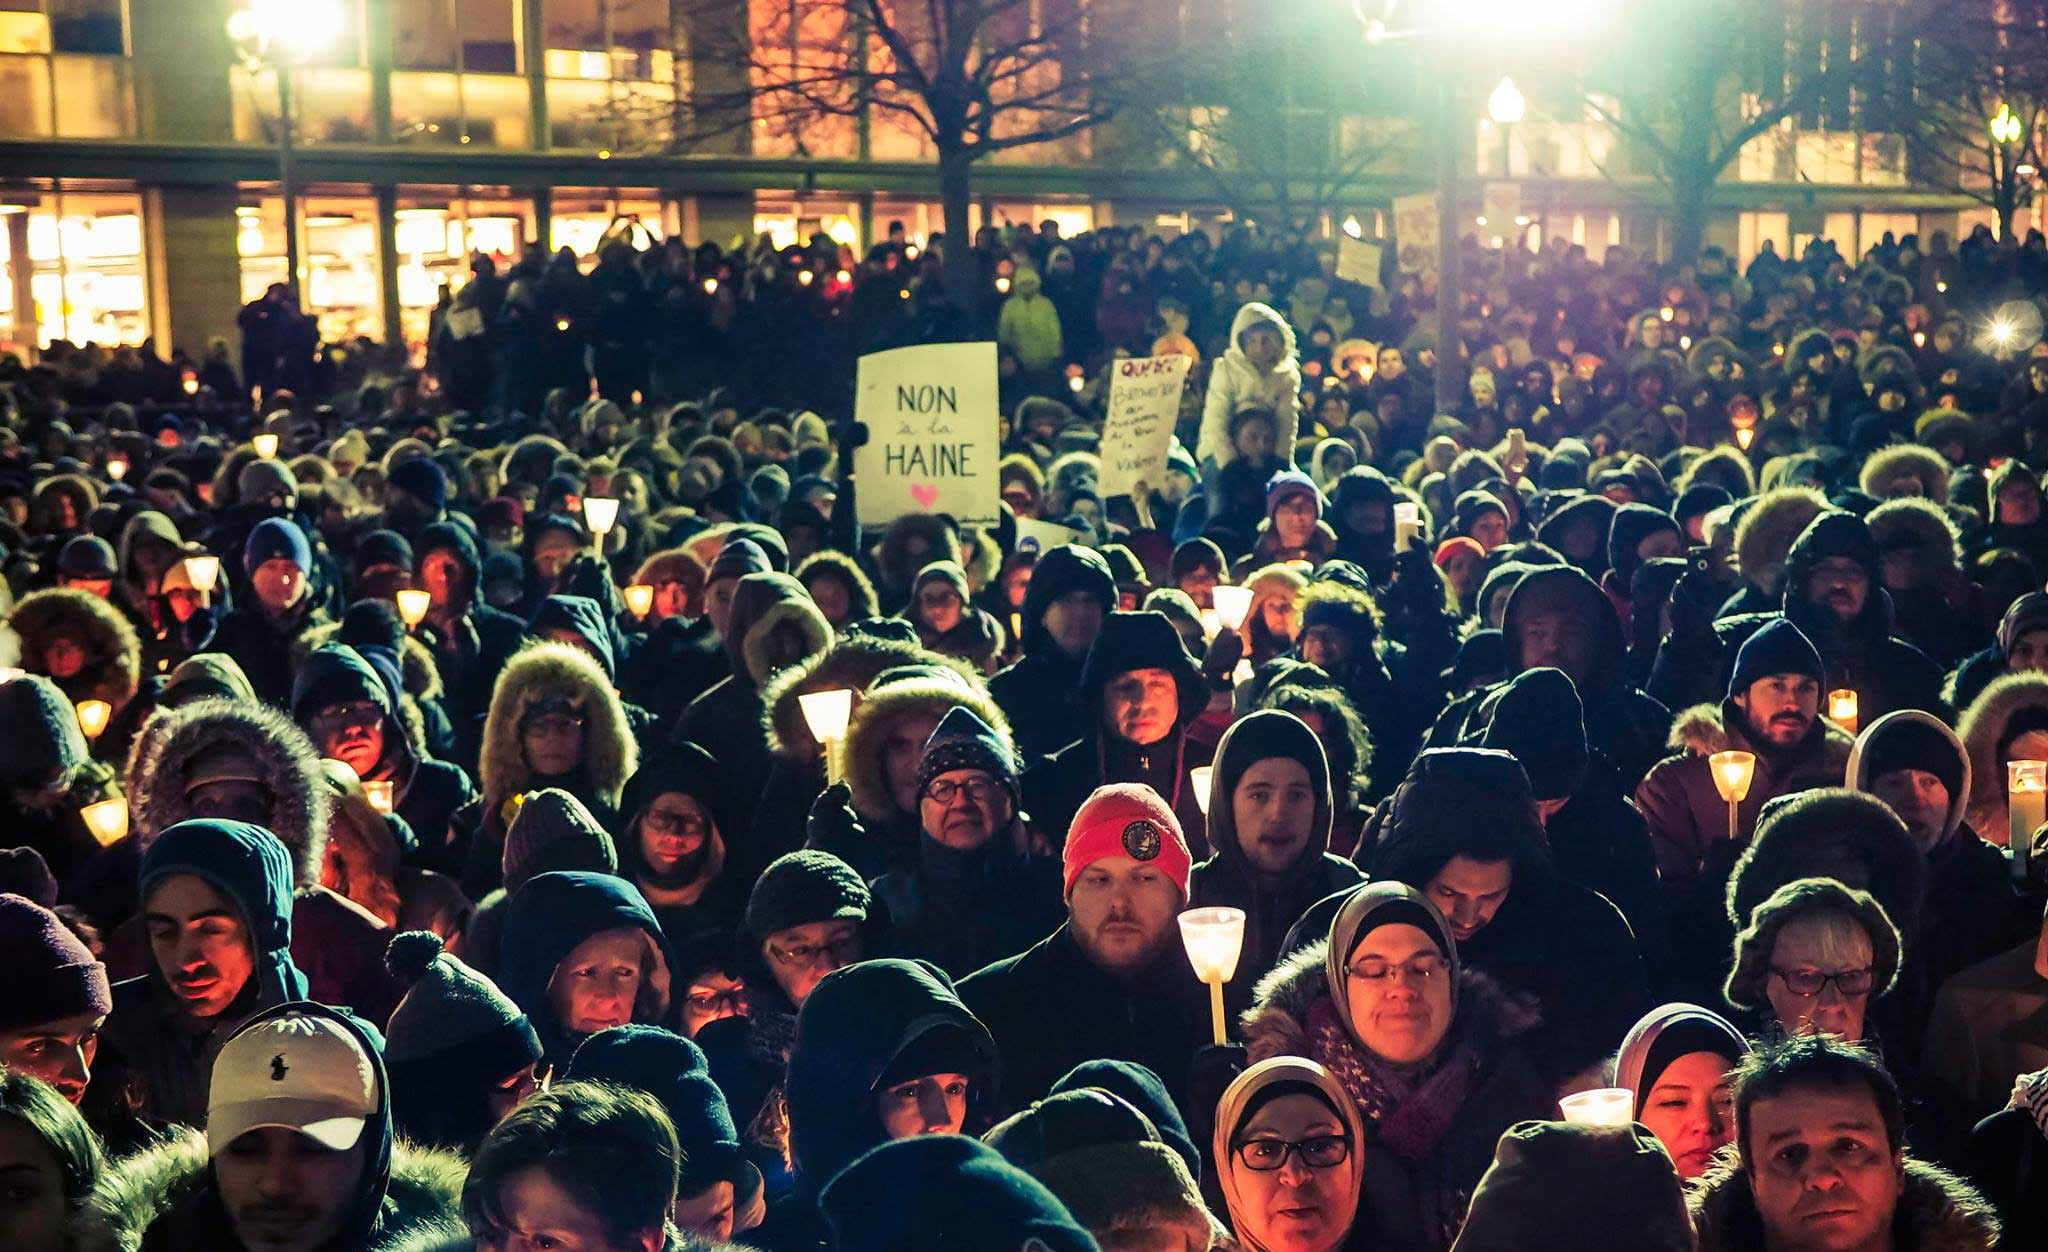 Vigile de solidarité à la suite de l'attentat de Québec